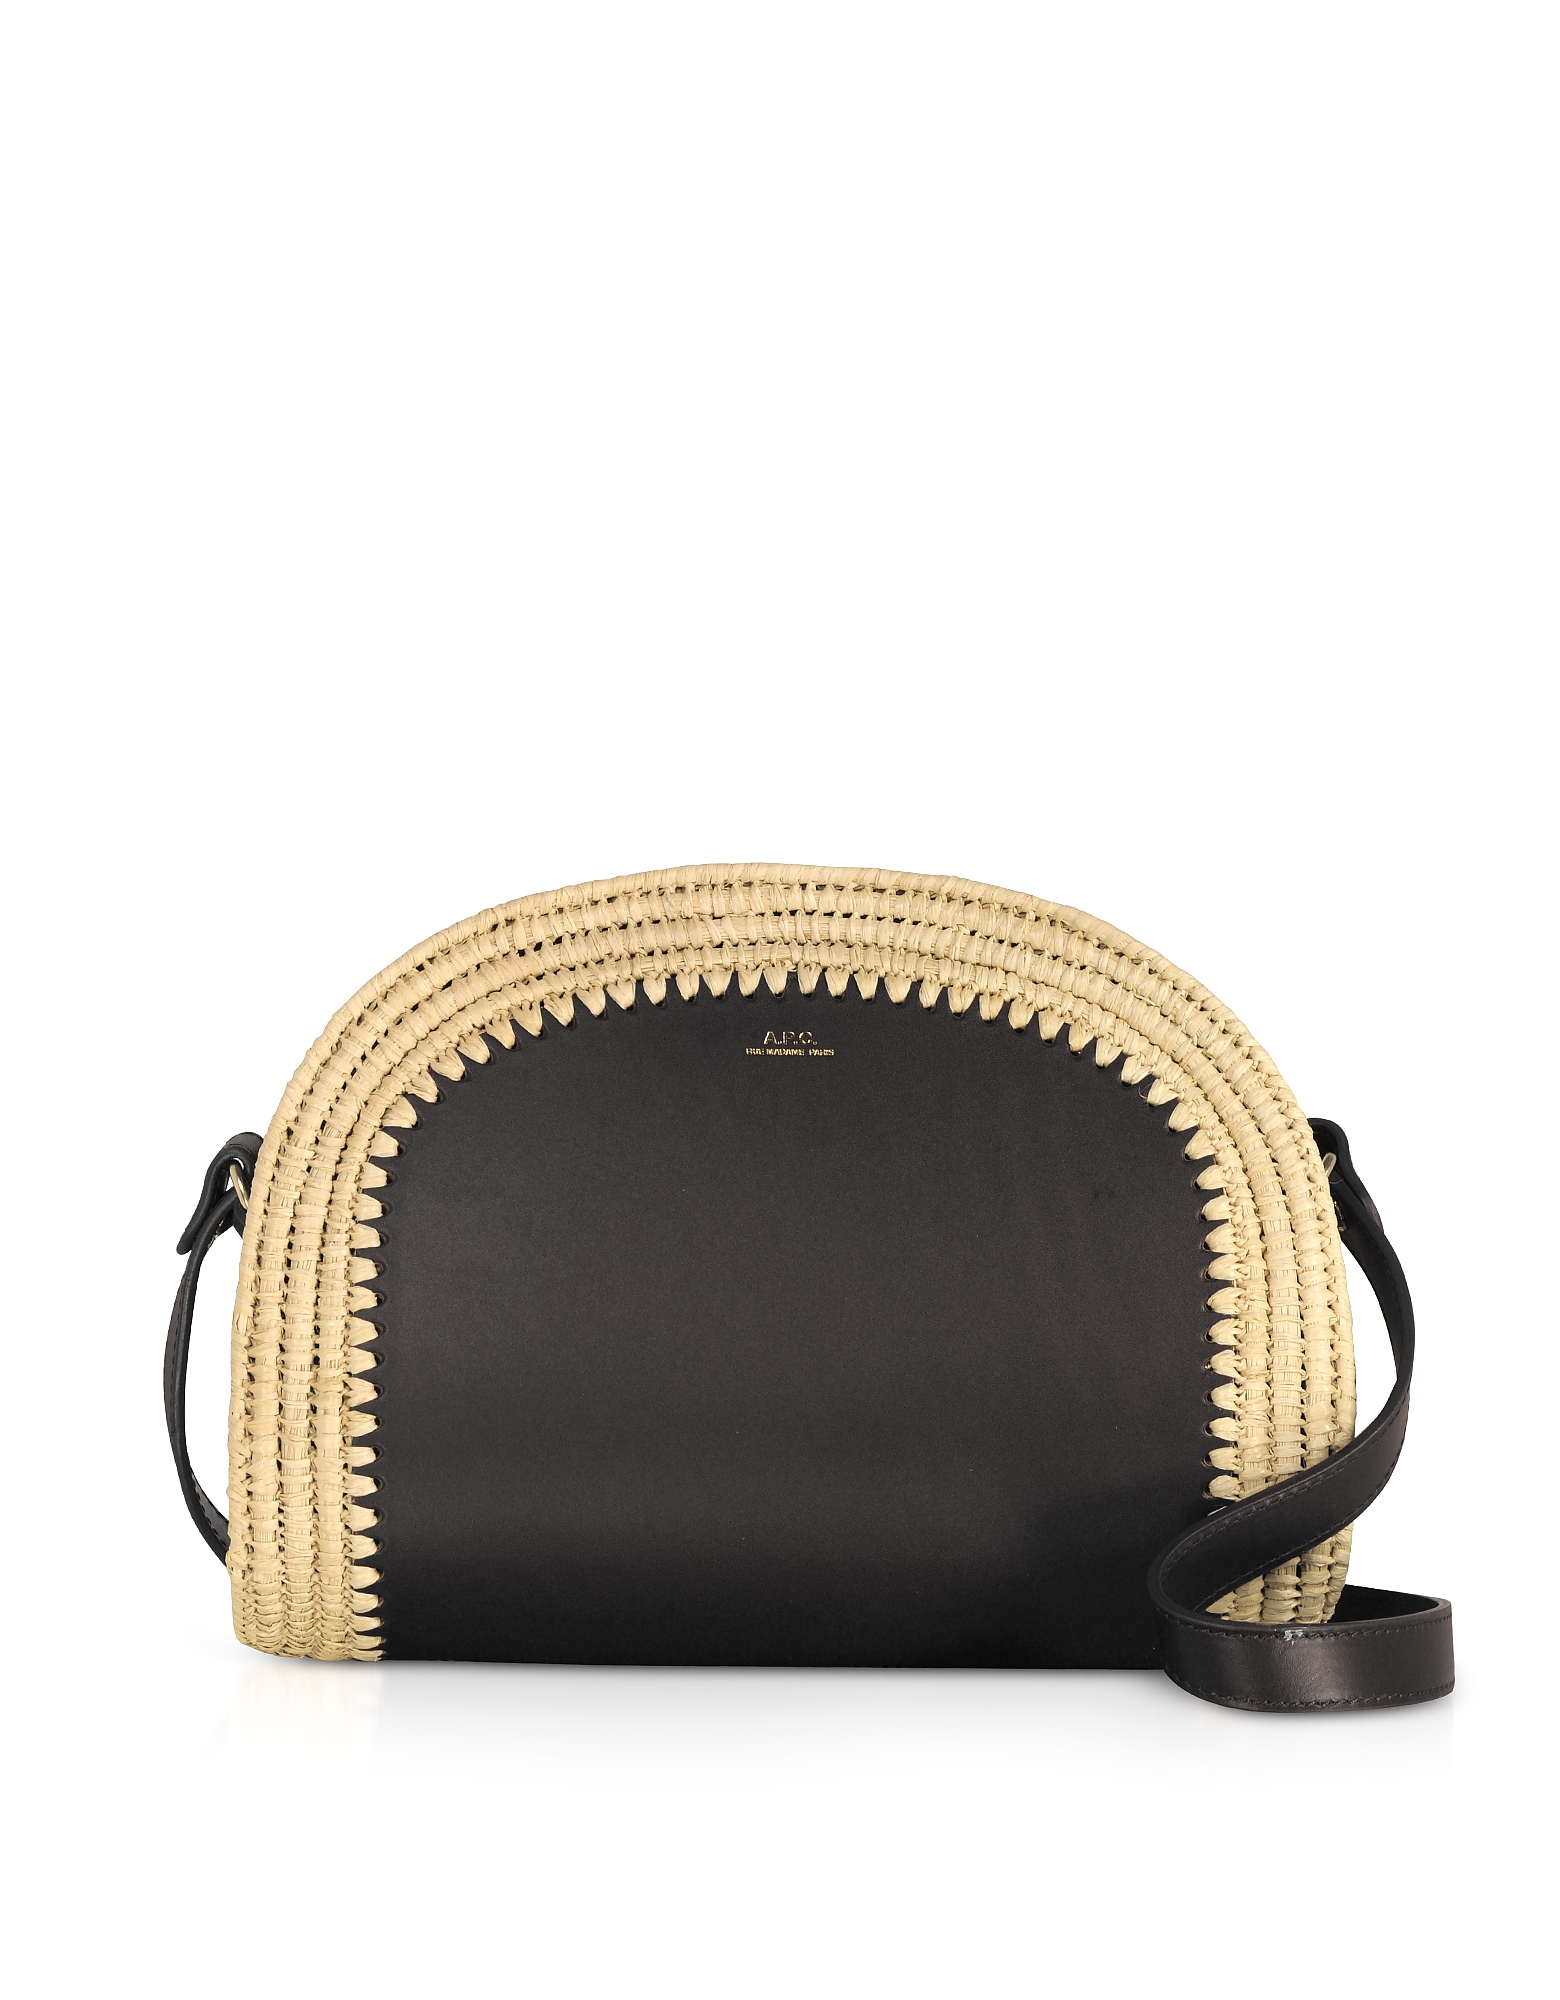 A.P.C. Designer Handbags, Woven Straw & Leather Demi-Lune Crossbody Bag